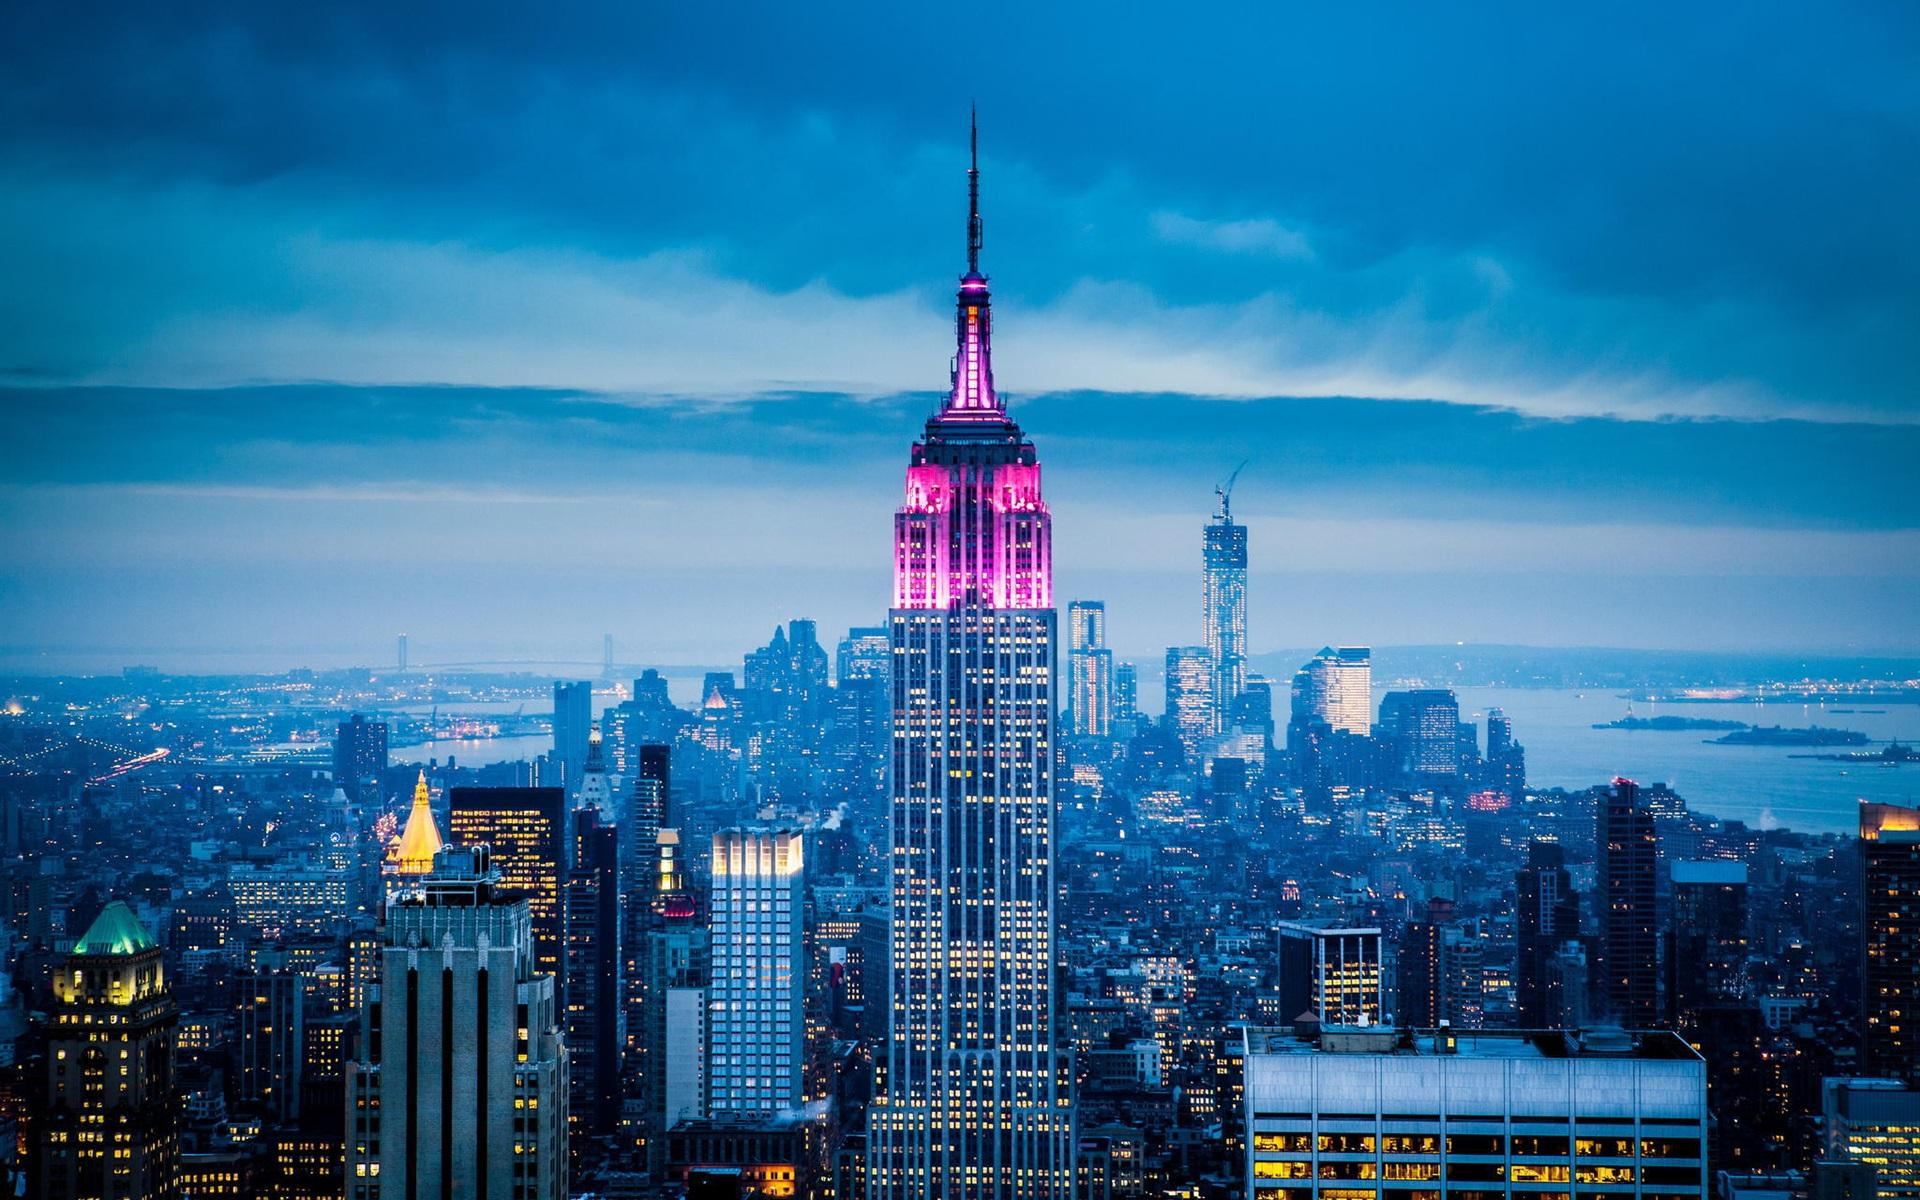 Cool Wallpaper Night Empire State Building - USA-New-York-City-skyscrapers-Empire-State-Building-night-lights_1920x1200  2018-496313.jpg